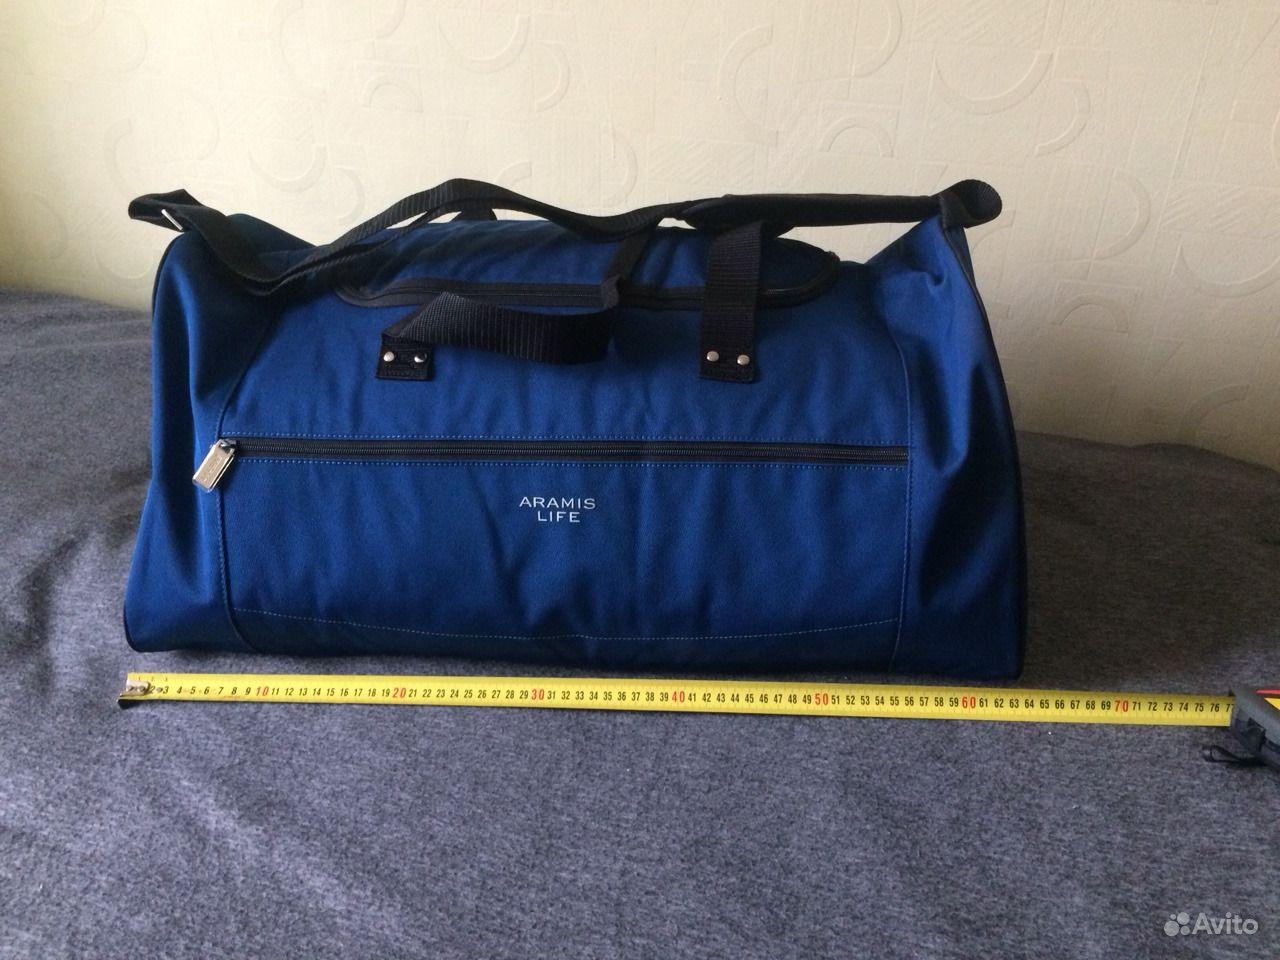 0bf6be598dc9 Спортивная сумка aramis life | Festima.Ru - Мониторинг объявлений